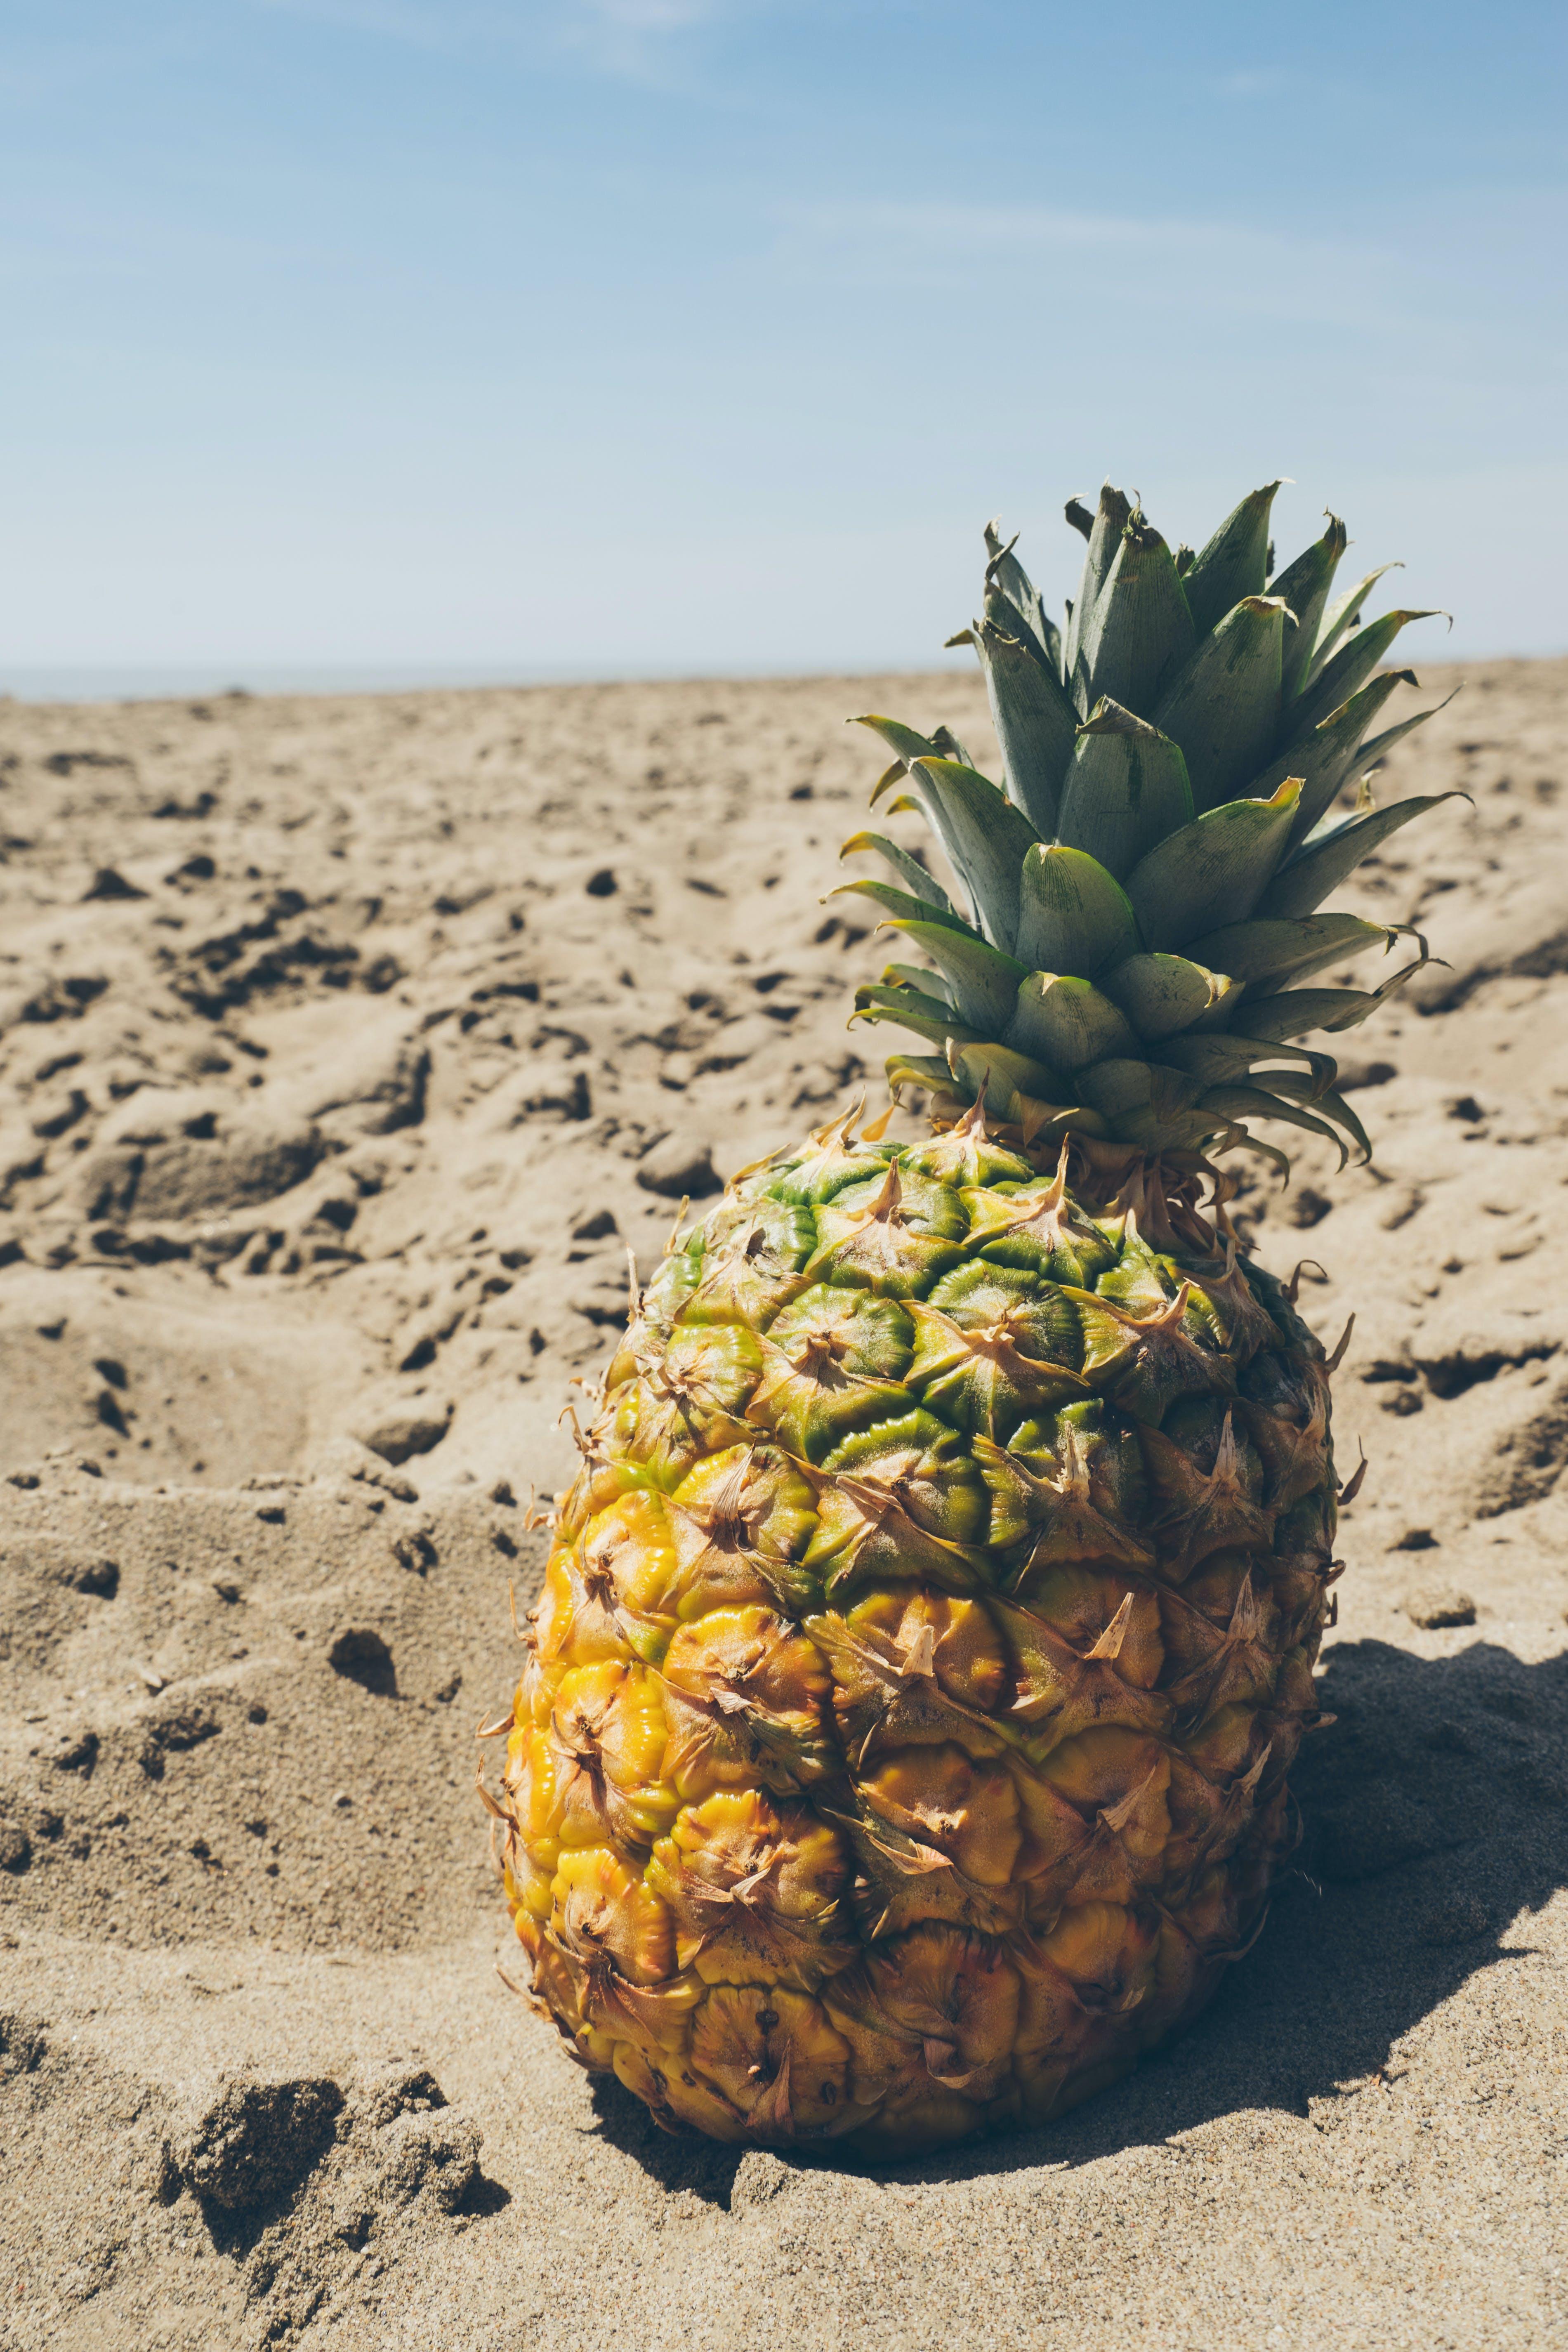 Gratis stockfoto met ananas, beachlife, blauwe lucht, blikveld